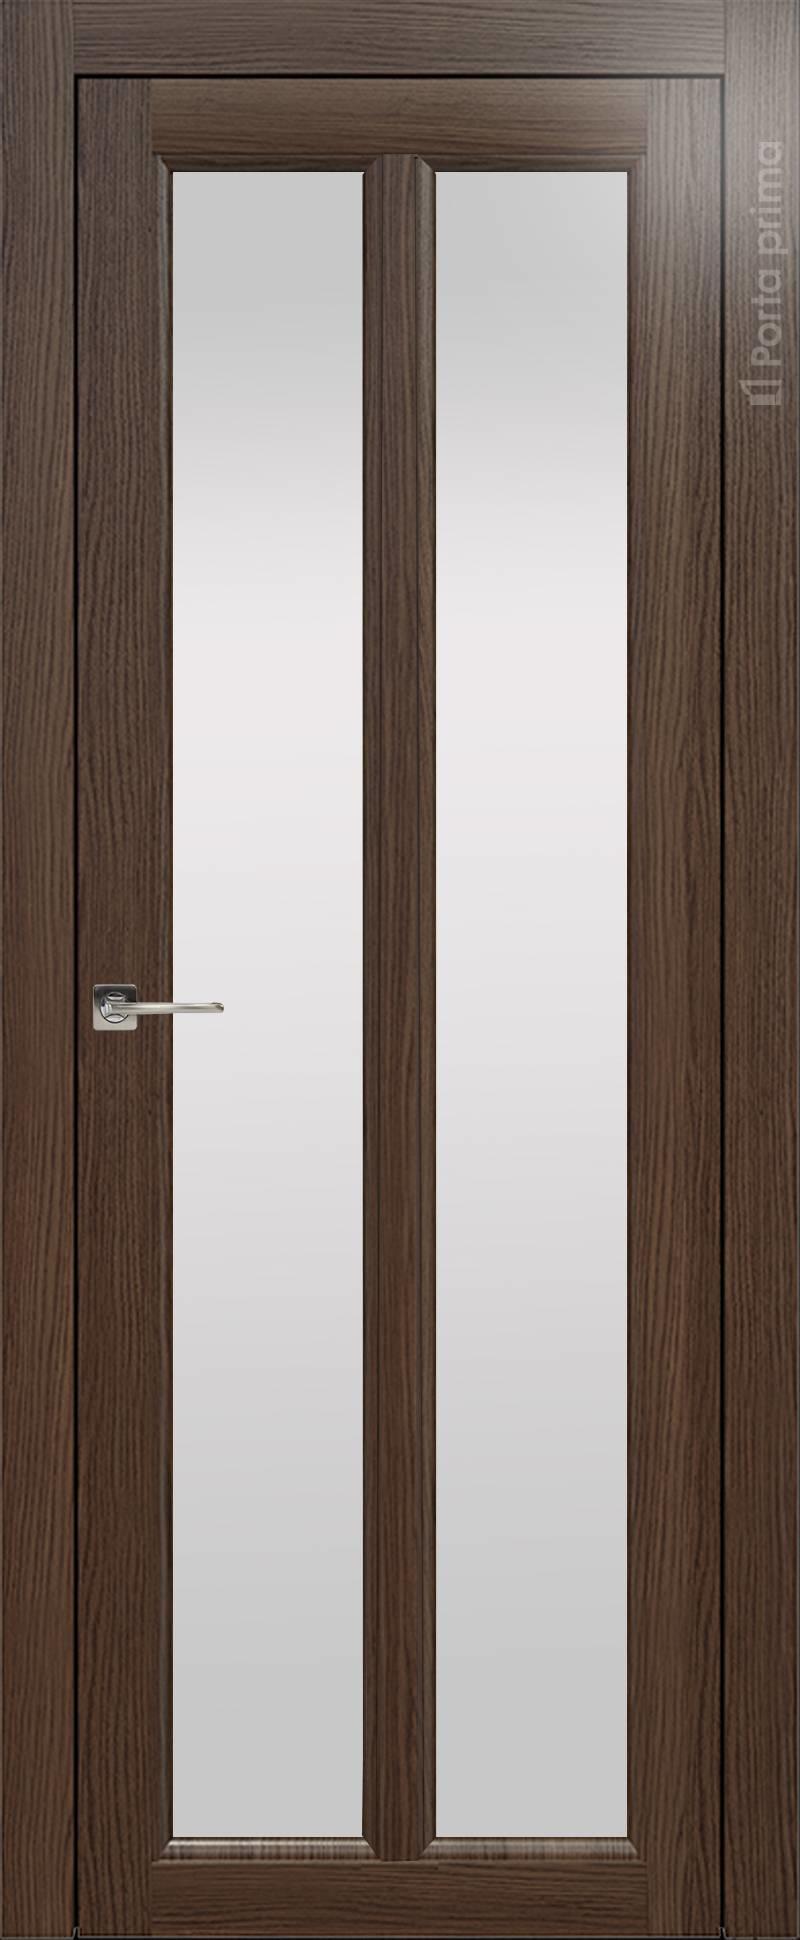 Sorrento-R Д4 цвет - Дуб торонто Со стеклом (ДО)